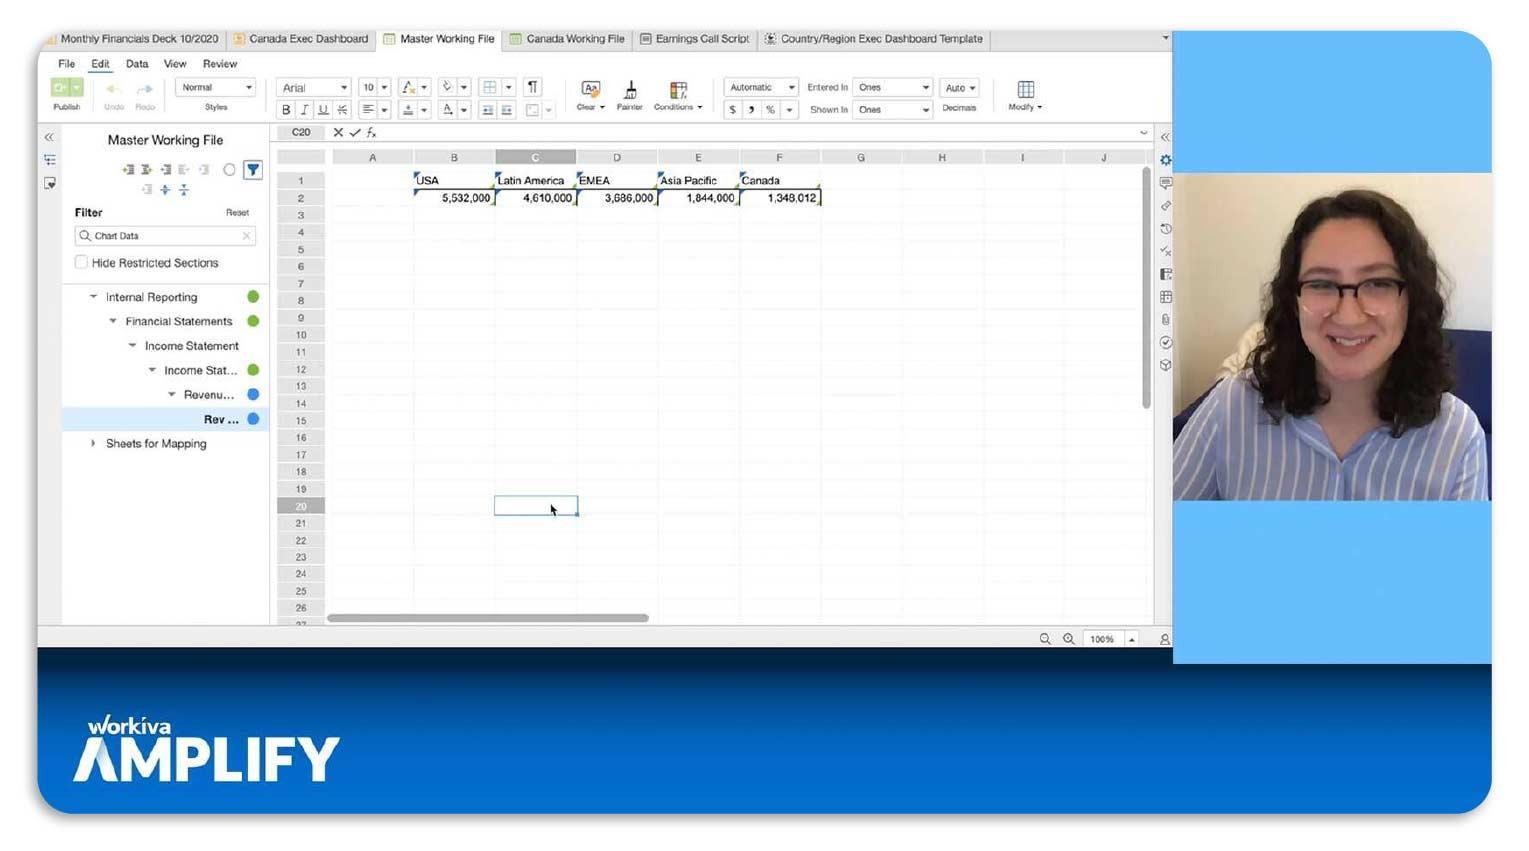 Workiva spreadsheet example